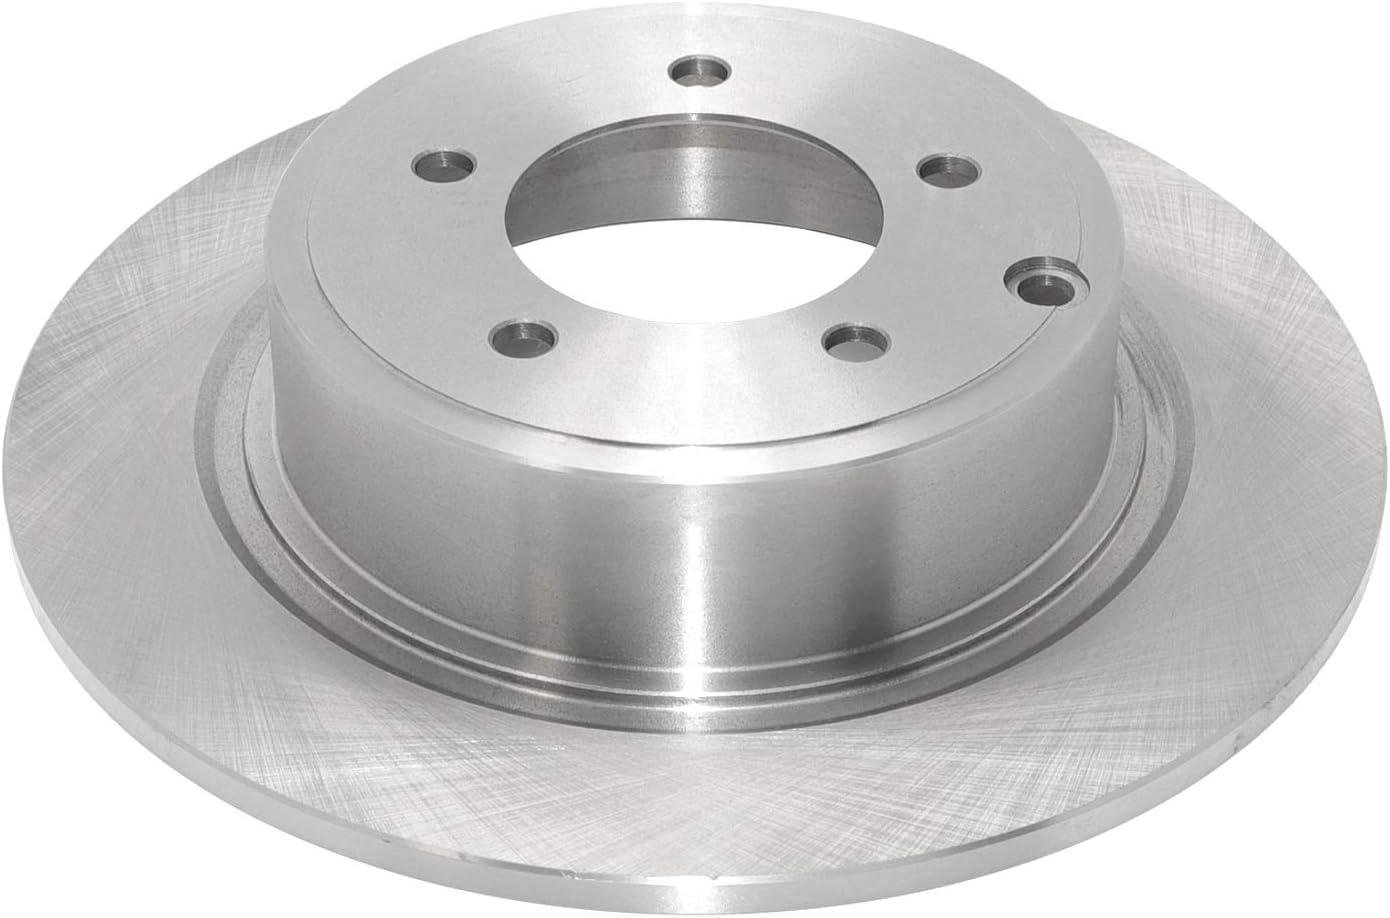 Dura International BR90075002 Rear Solid Disc Premium Electrophoretic Brake Rotor